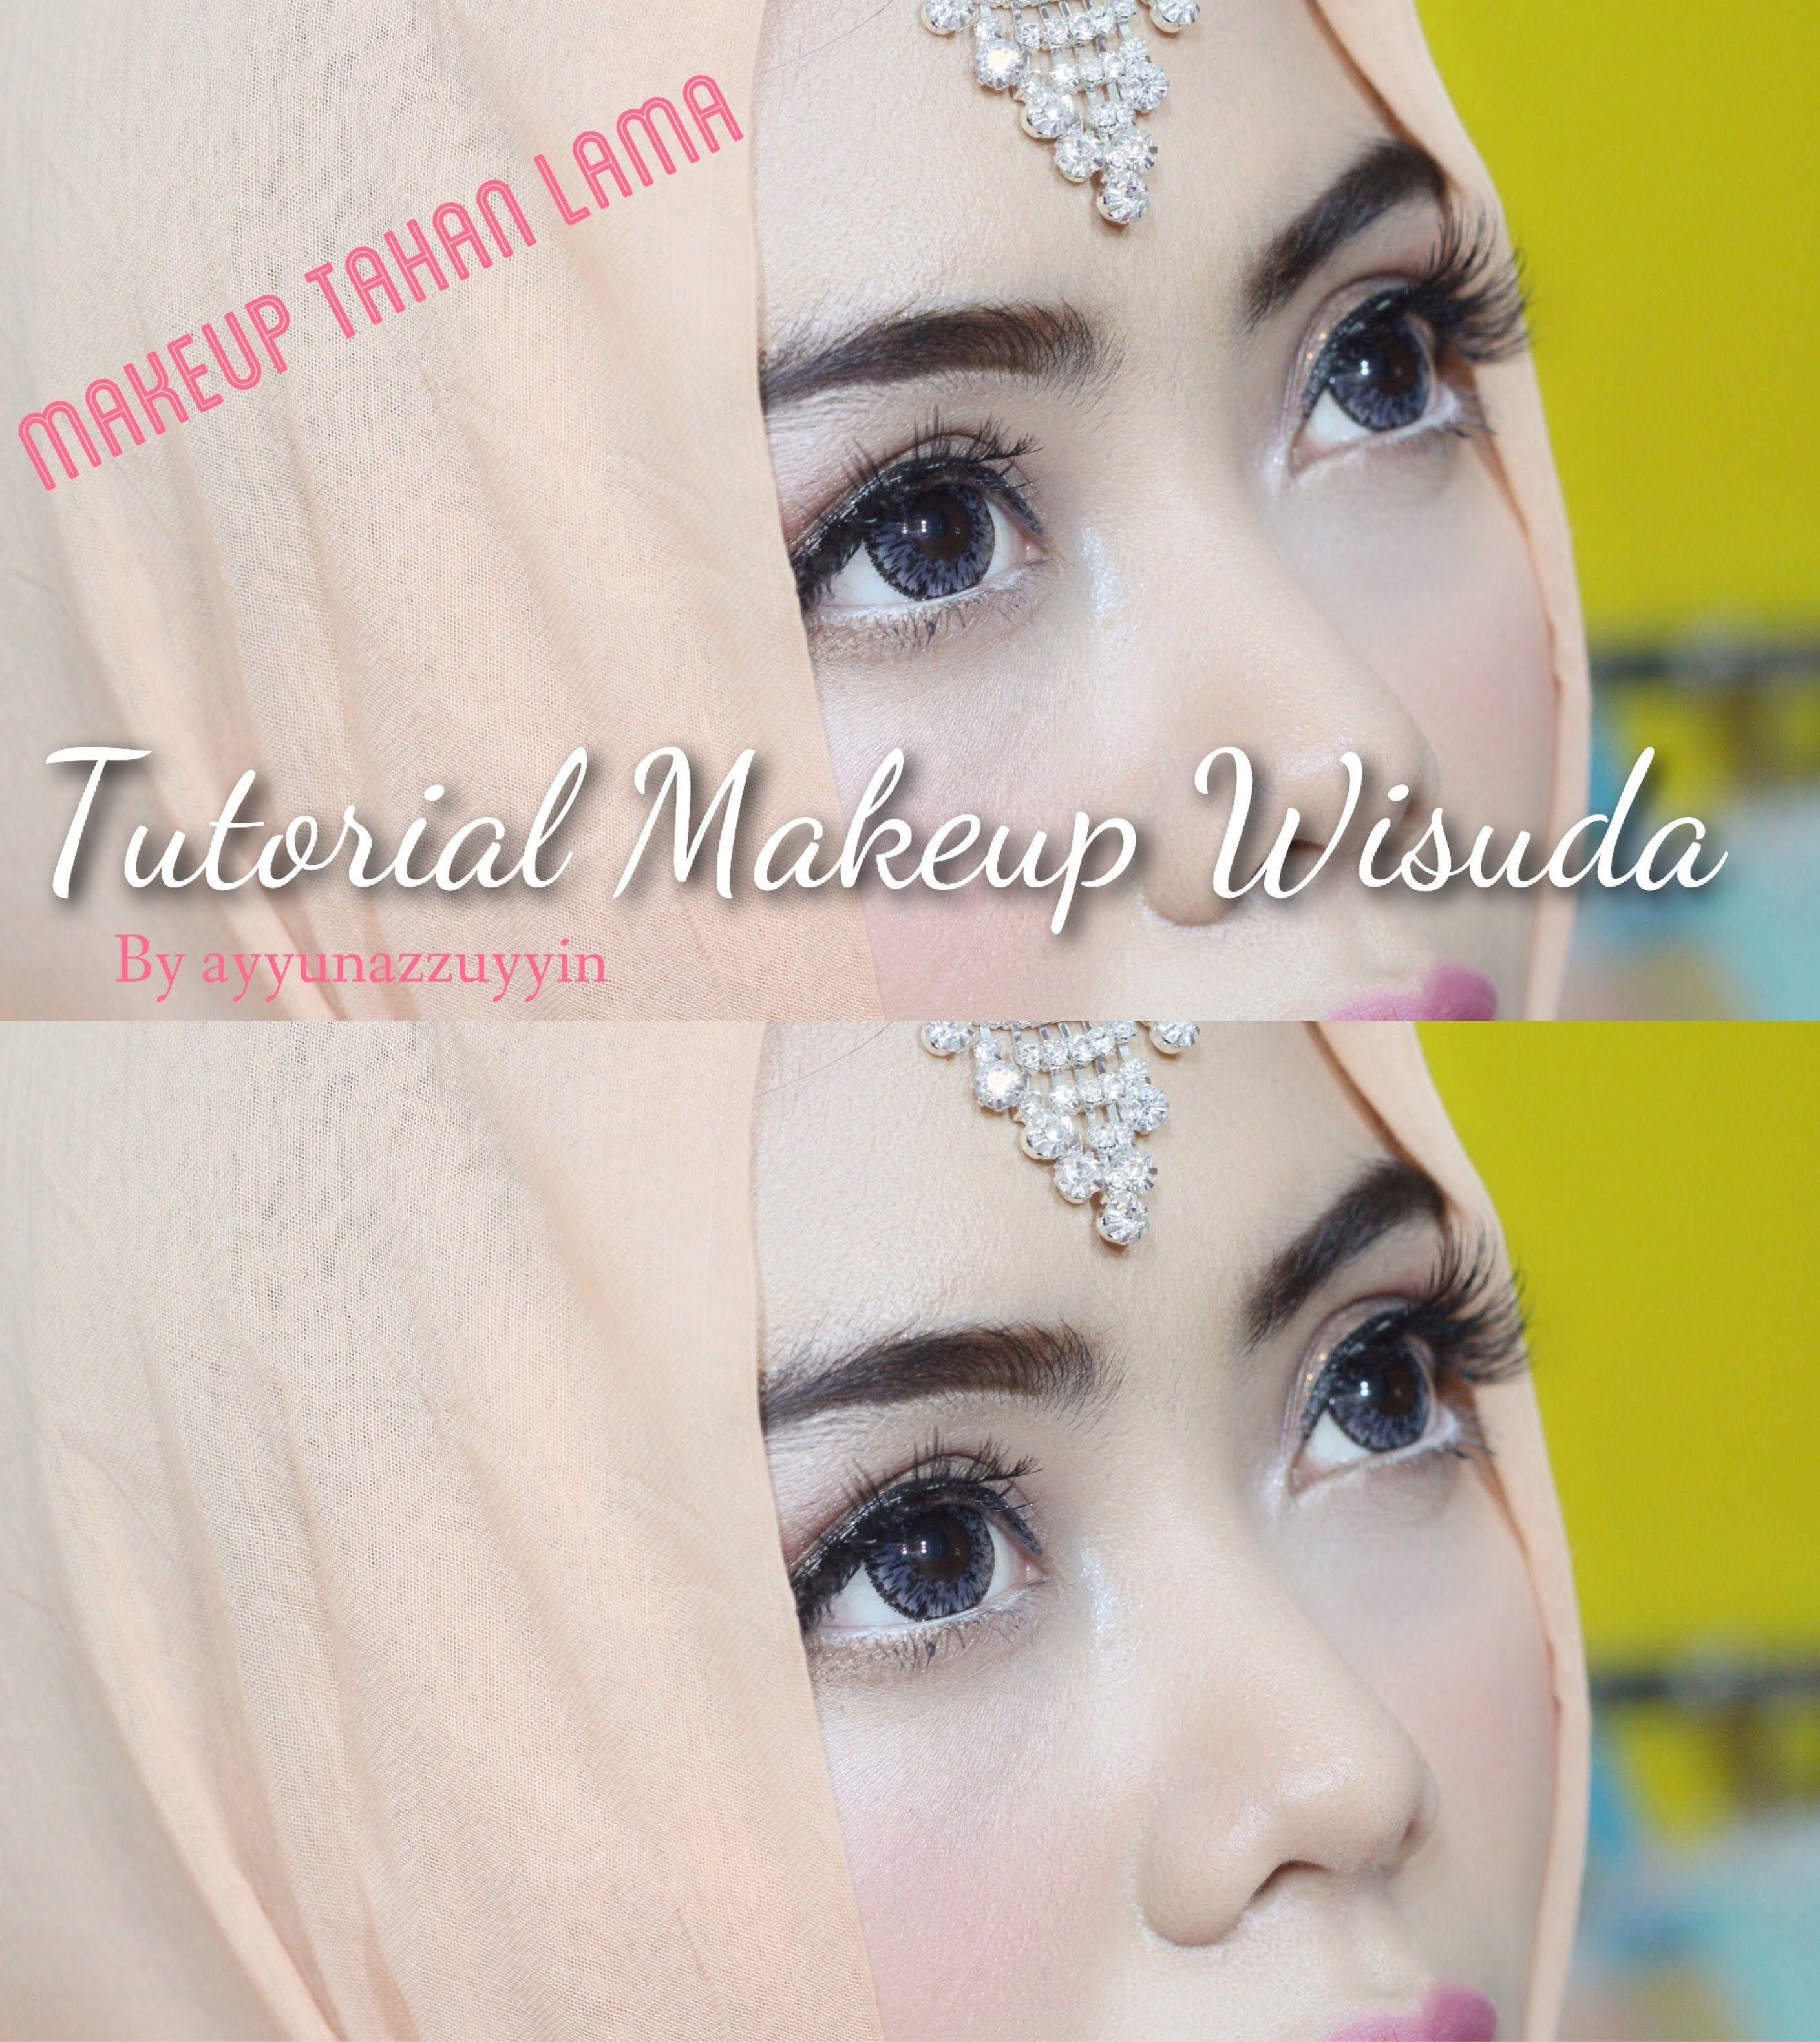 Tutorial Make Up Wisuda (Make Up Tahan Lama) Wisuda